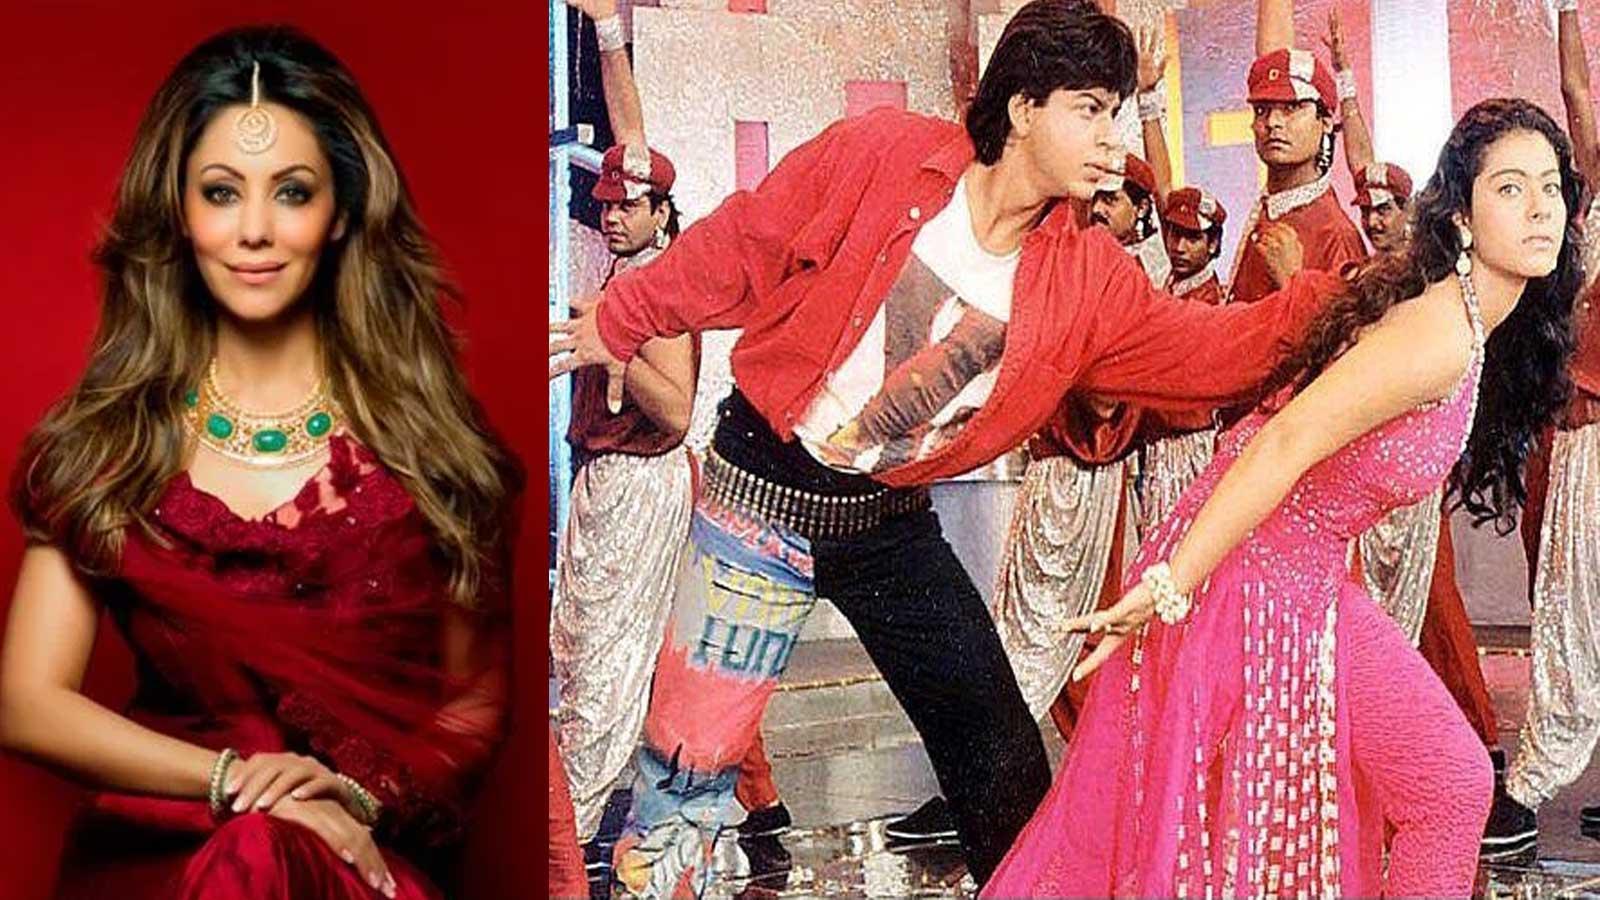 did-you-know-shah-rukh-khans-wife-gauri-khan-designed-his-look-in-ye-kaali-kaali-aankhen-song-from-baazigar